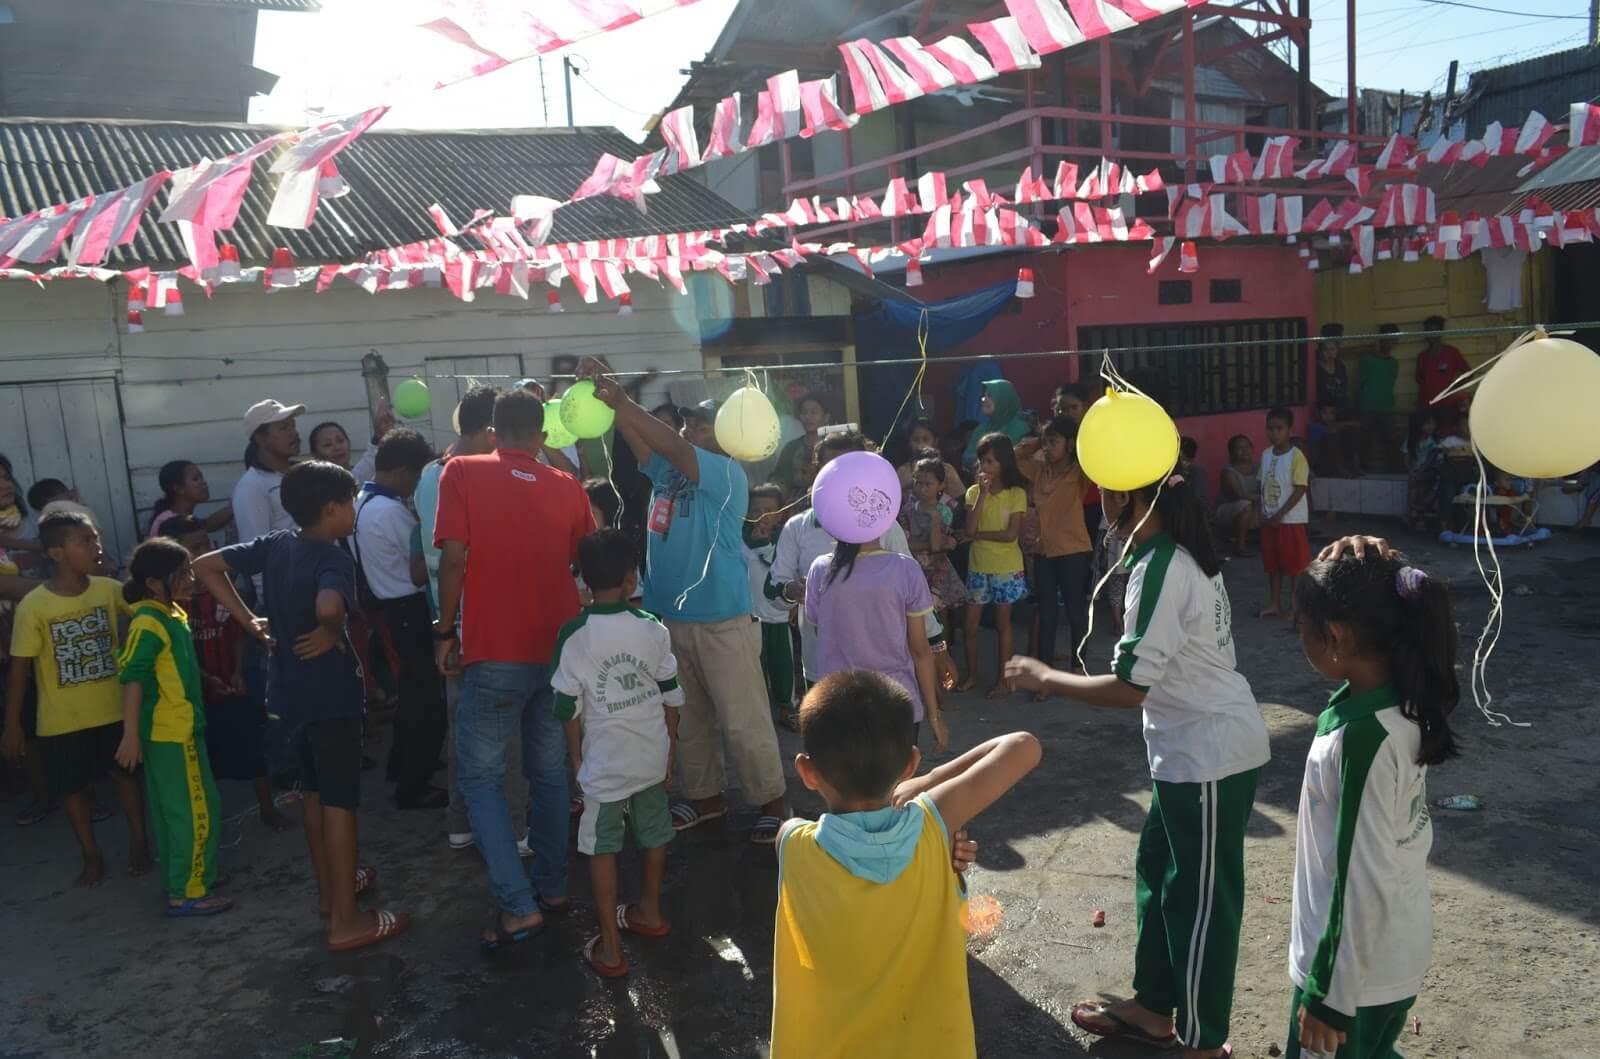 lomba 17 agustus agustusan memecahkan balon isi air